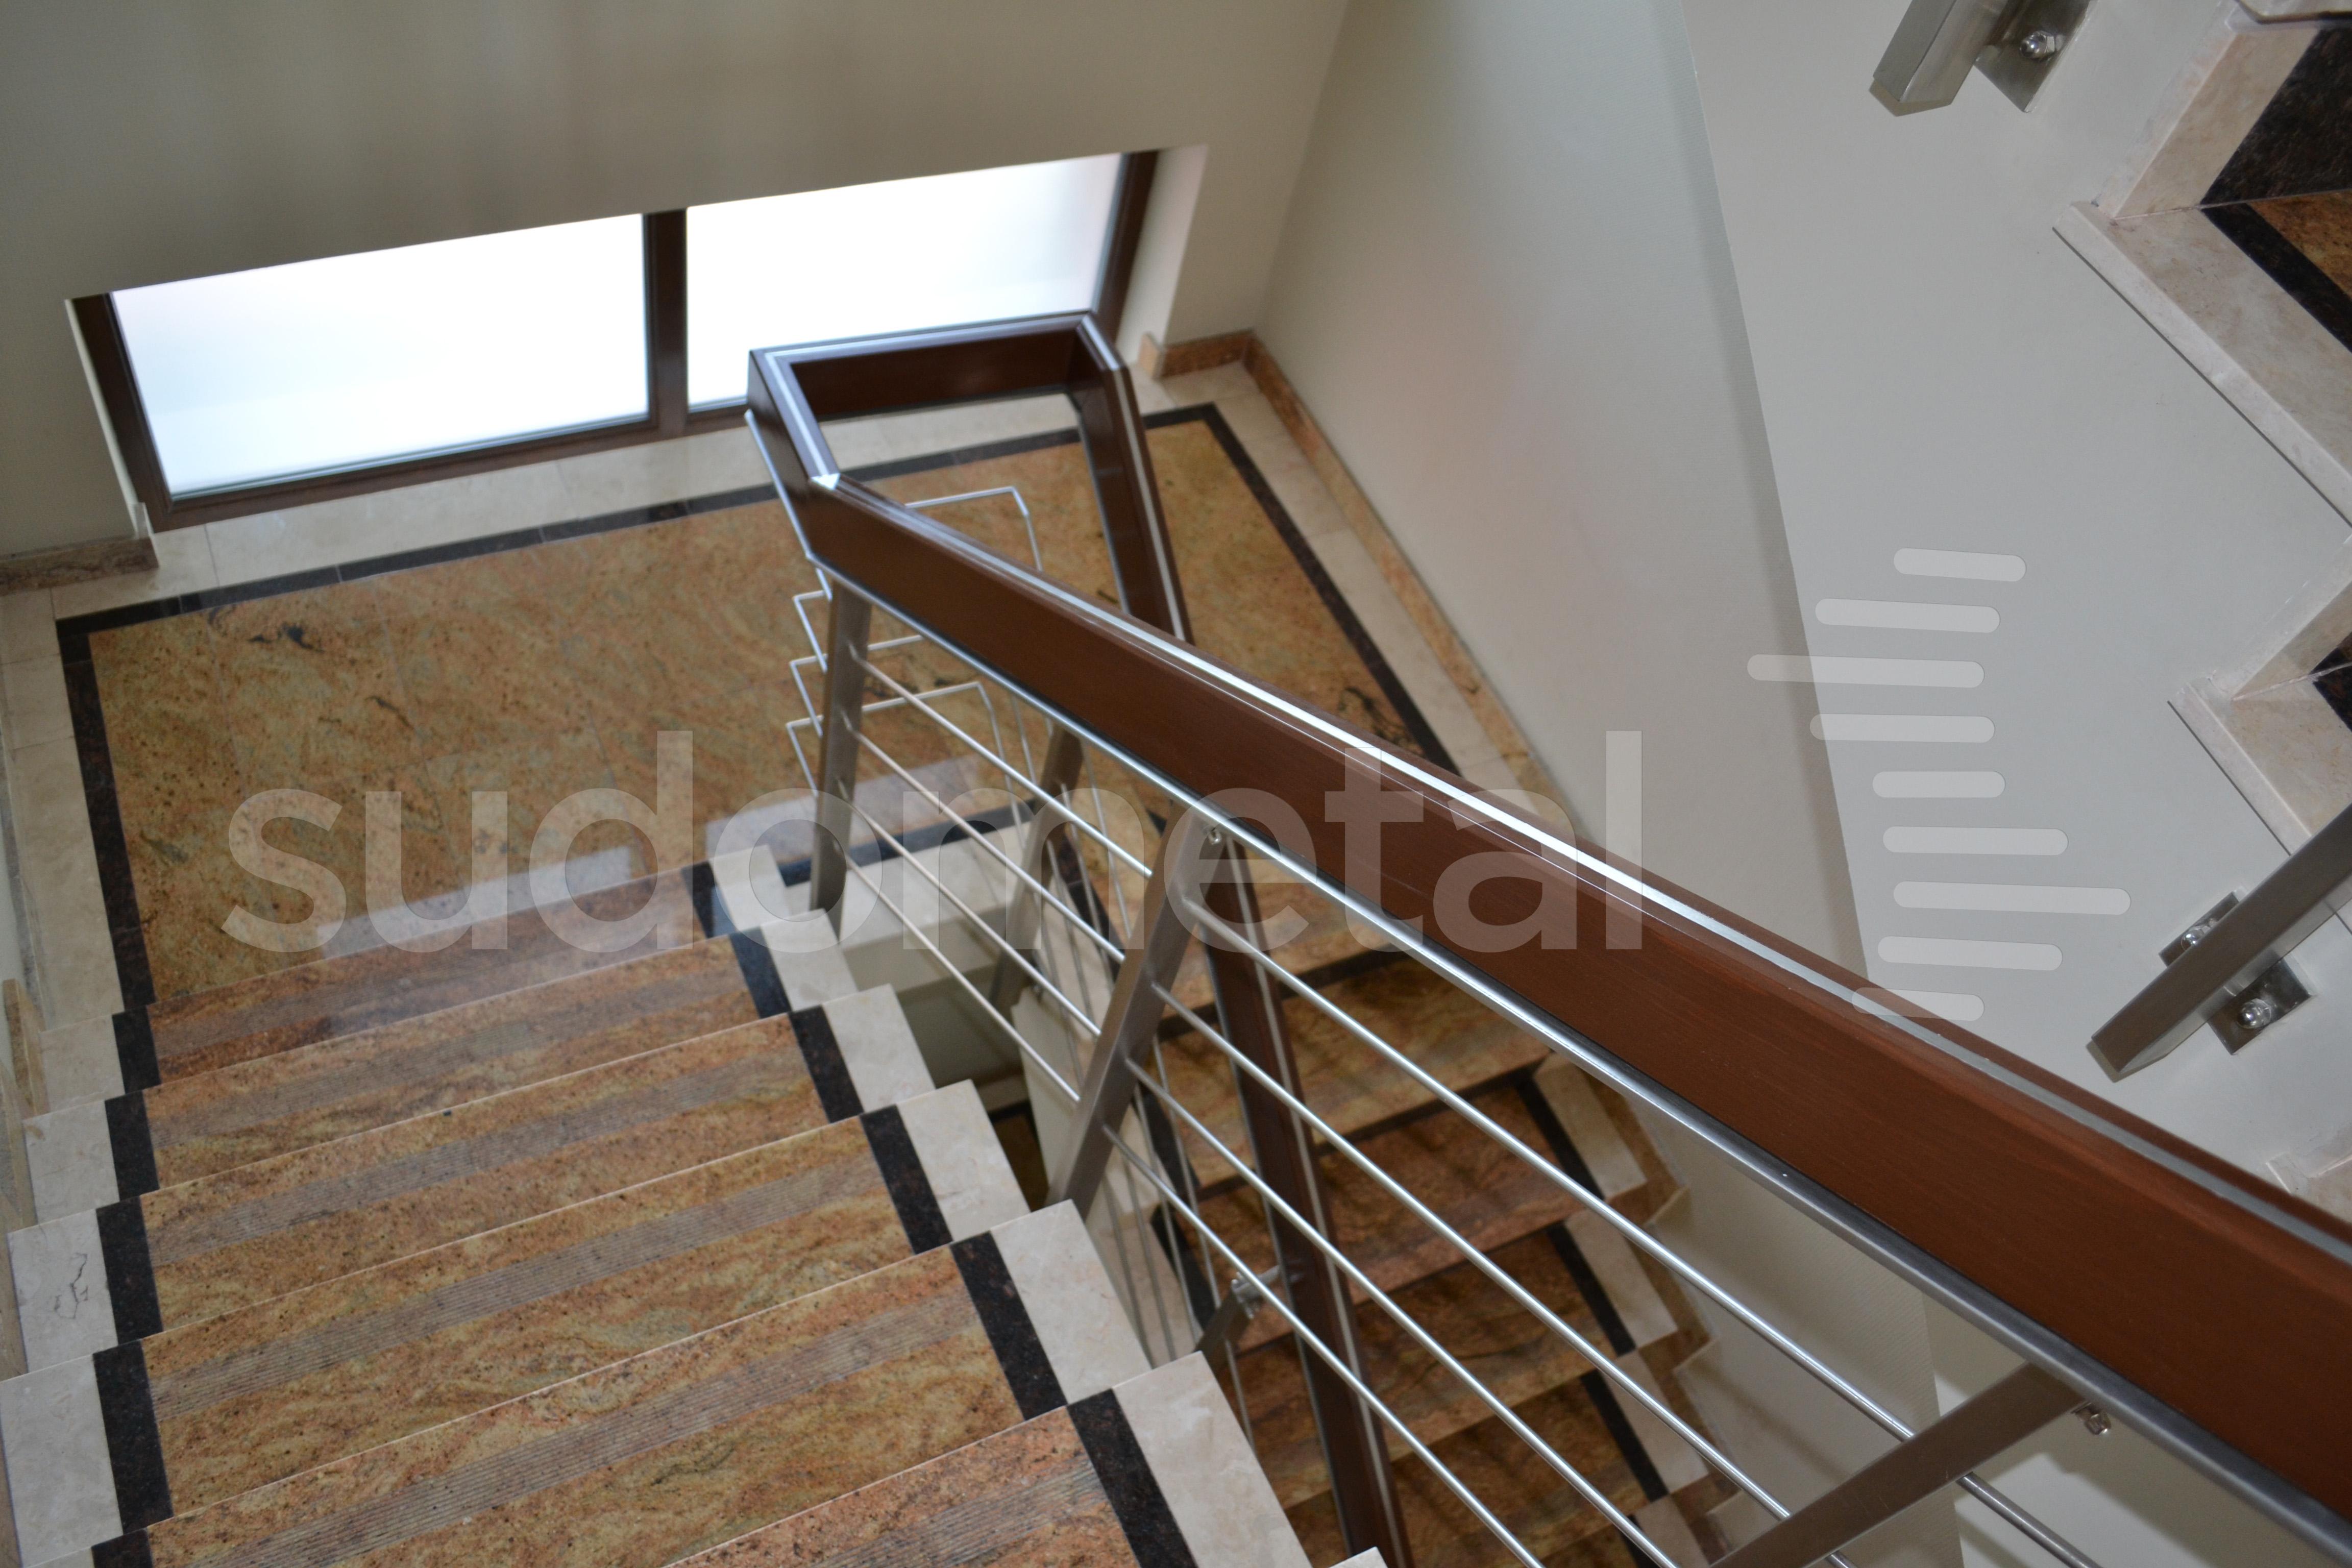 Balustrade din inox-lemn - Balustrada Hotel Tolea SUDOMETAL - Poza 1